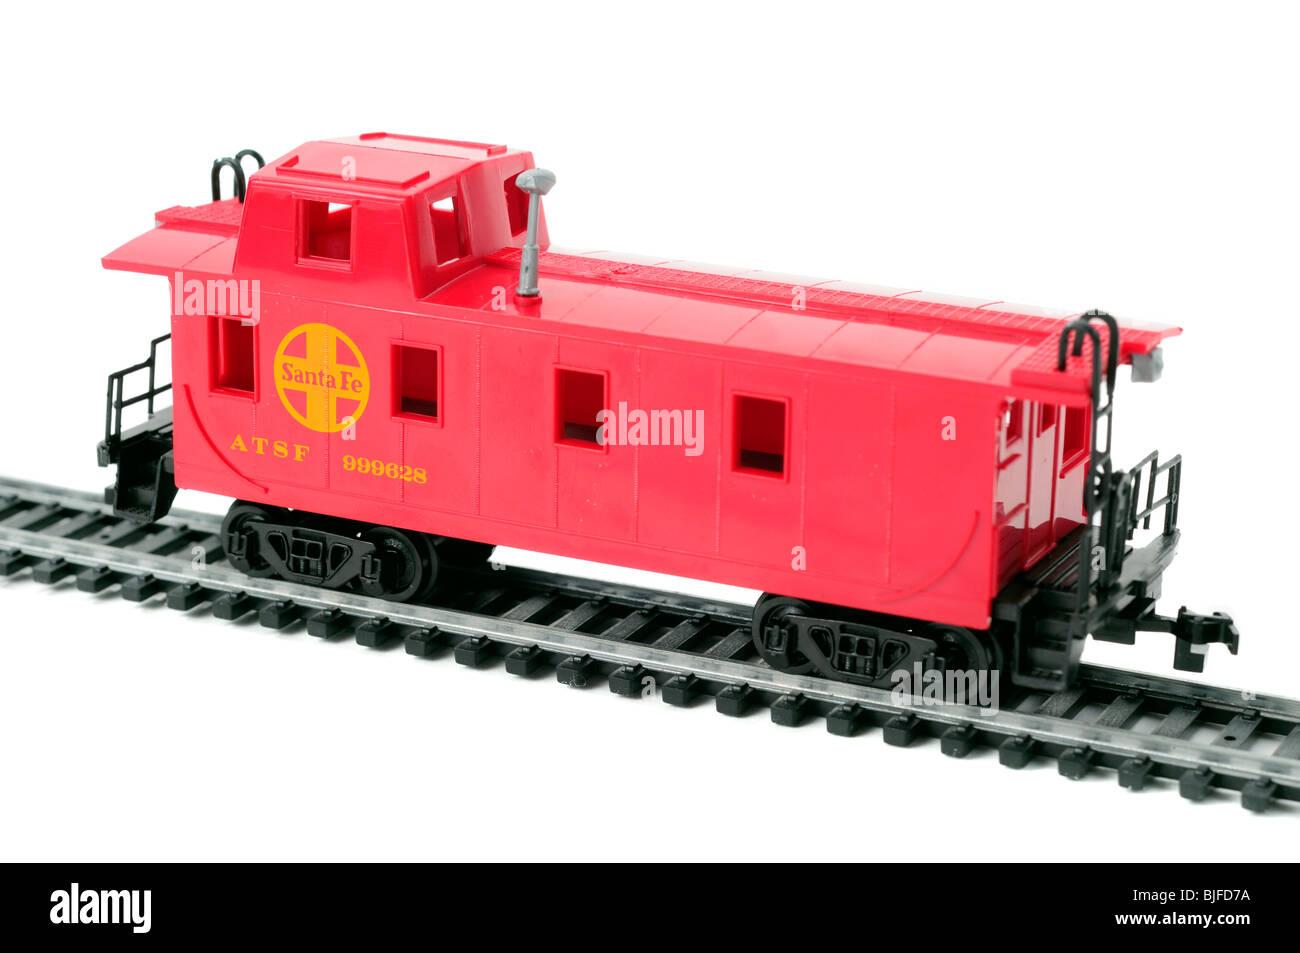 Train Scale Model Railroad Car Of A Santa Fe Caboose - Stock Image